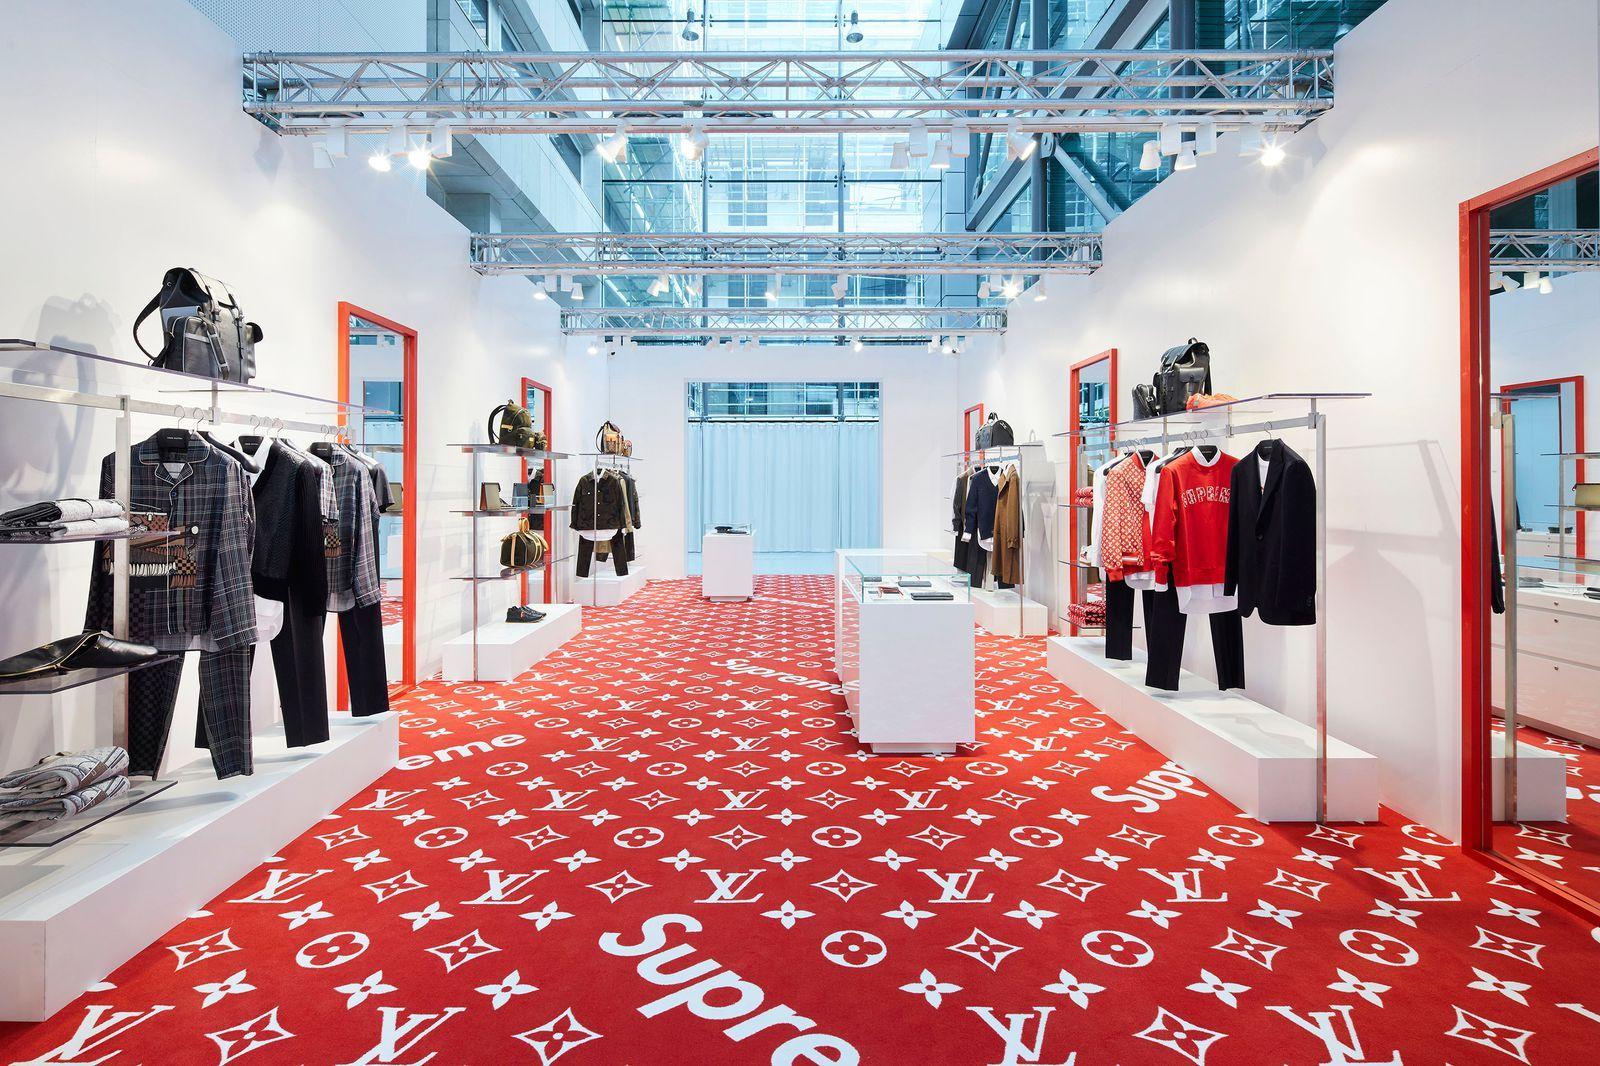 Behold  Louis Vuitton s Supreme pop-up store has arrived in London-  HarpersBAZAARUK 735f3eeaff